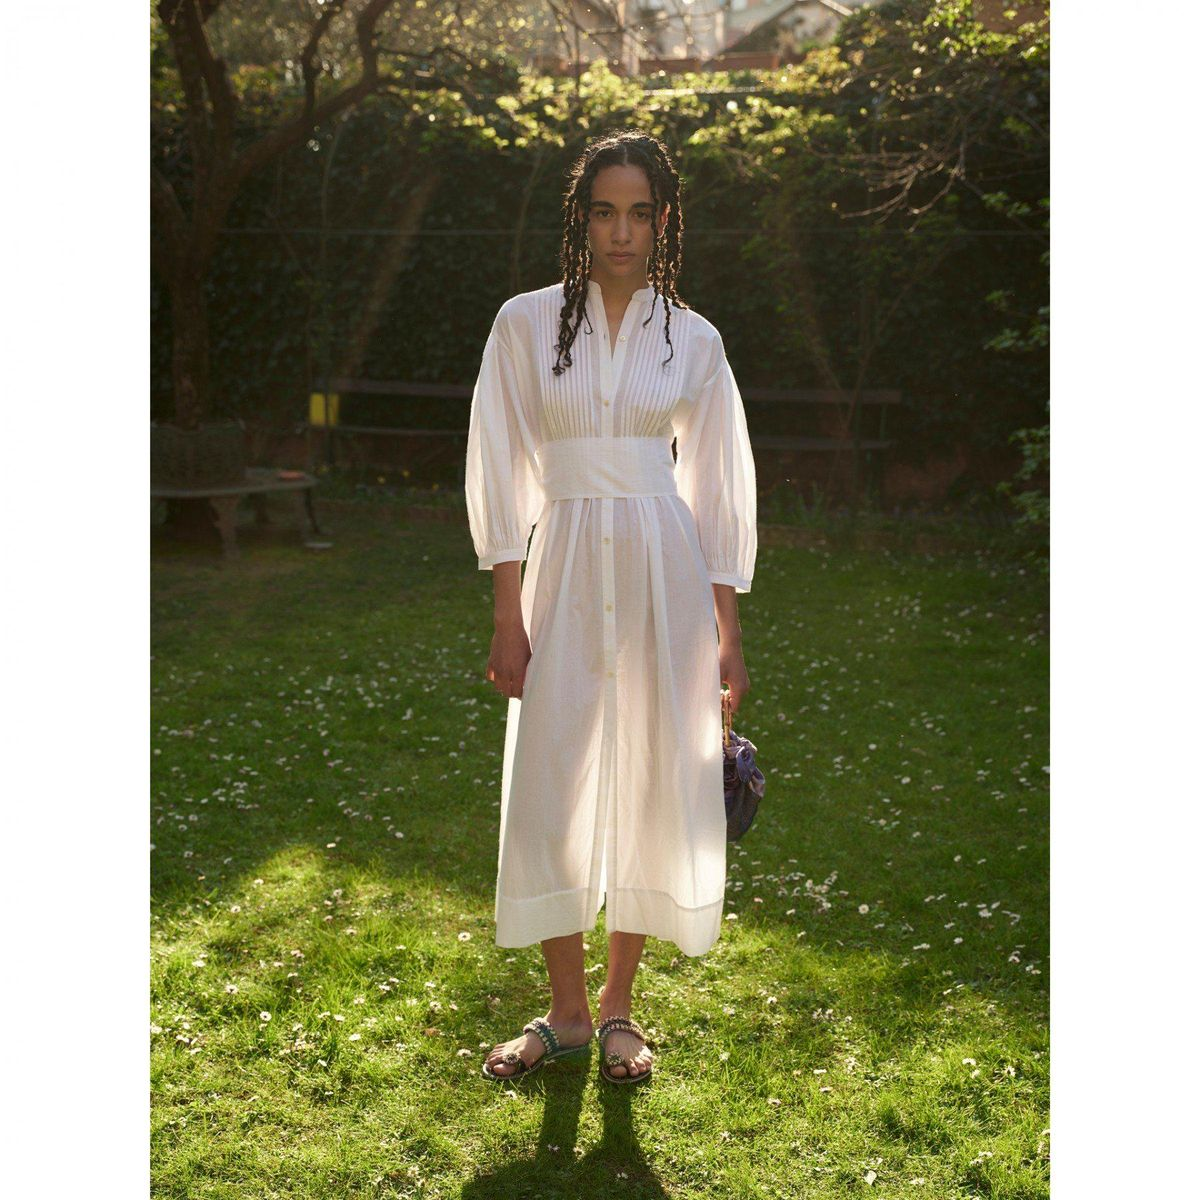 emily levine blouse dress